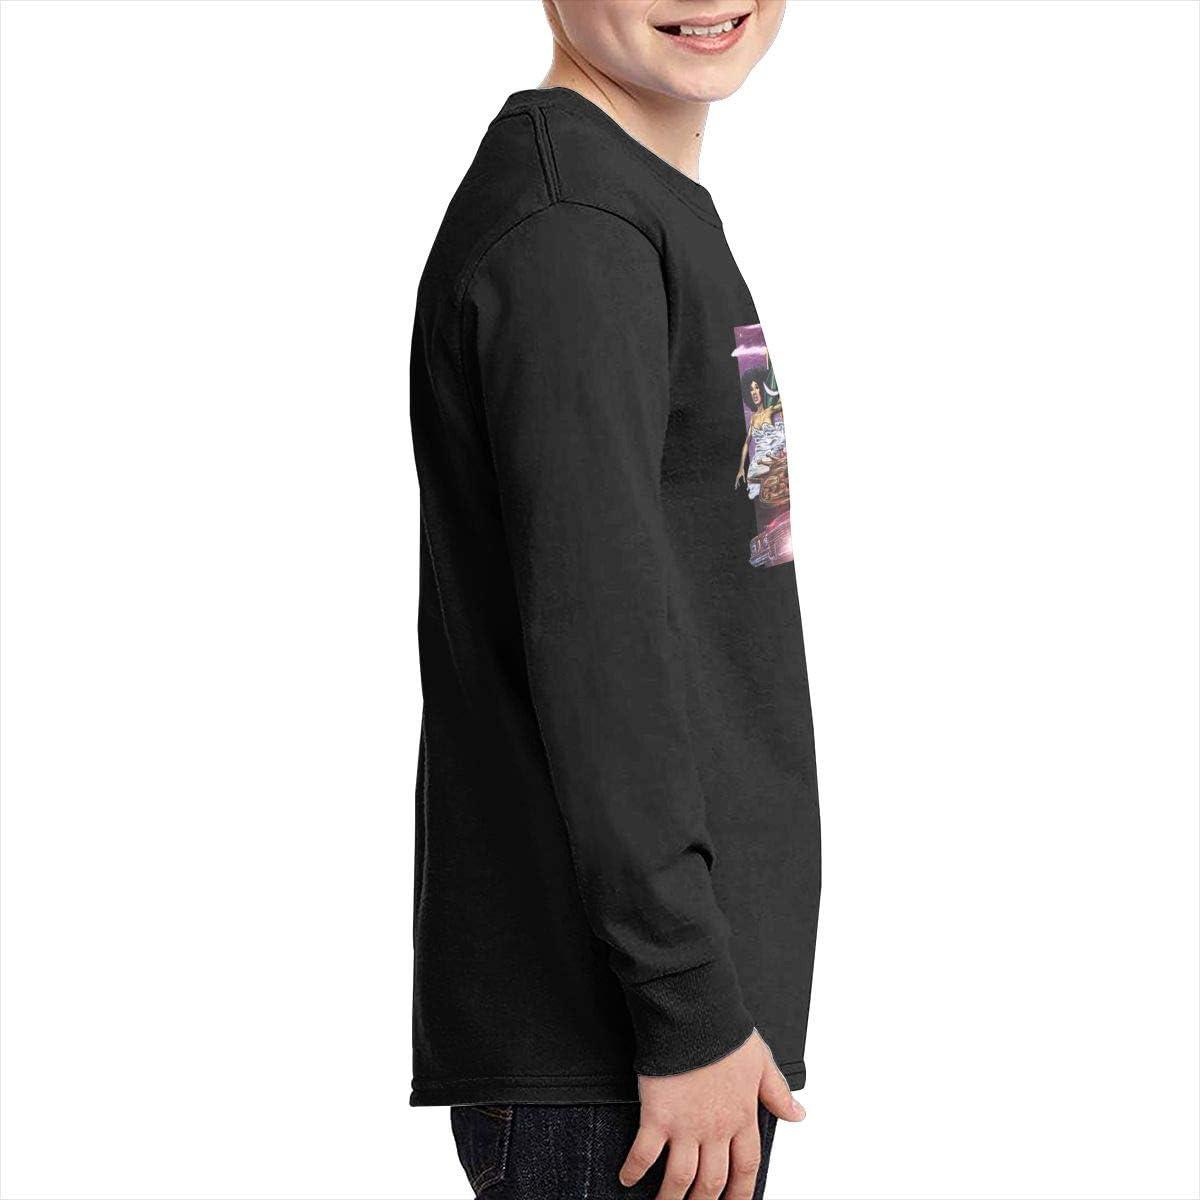 RhteGui Outkast Boys /& Girls Junior Vintage Long Sleeve T-Shirt Black